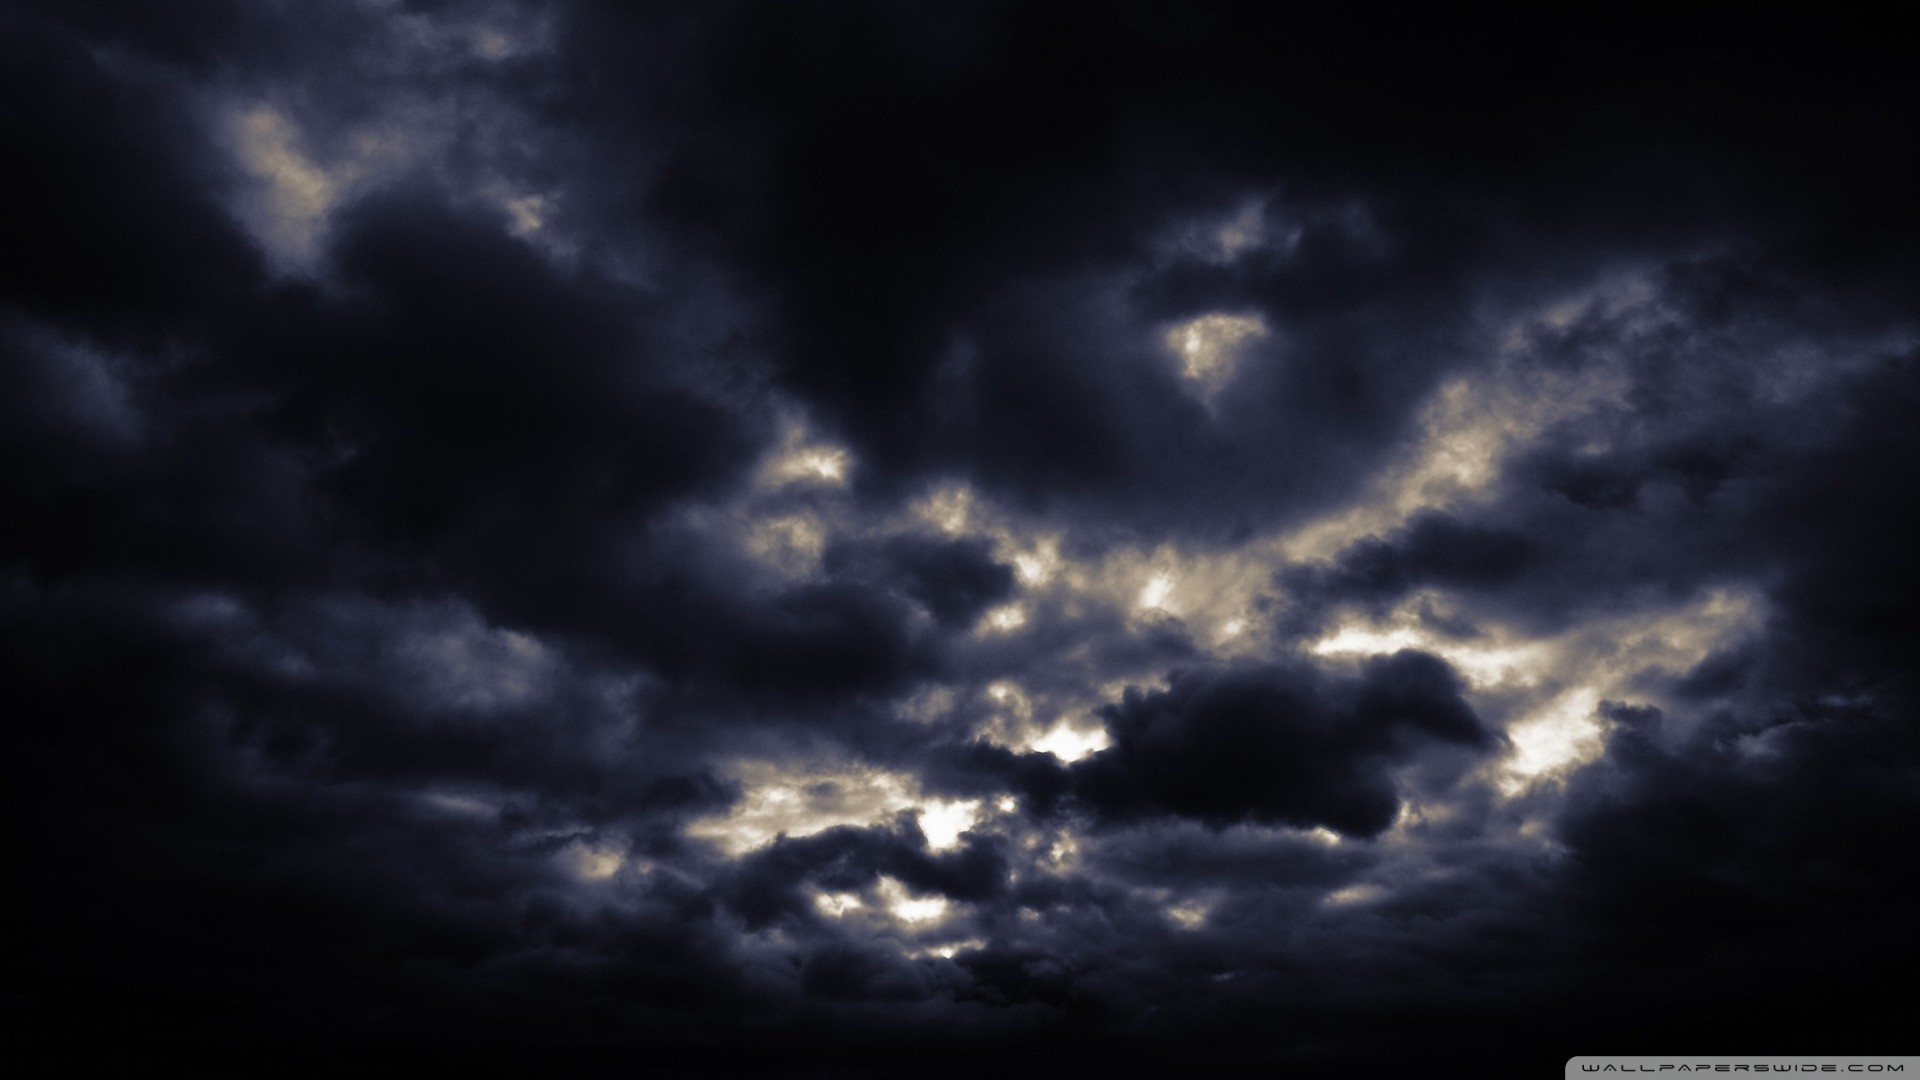 Dark Clouds Wallpaper 73 Images